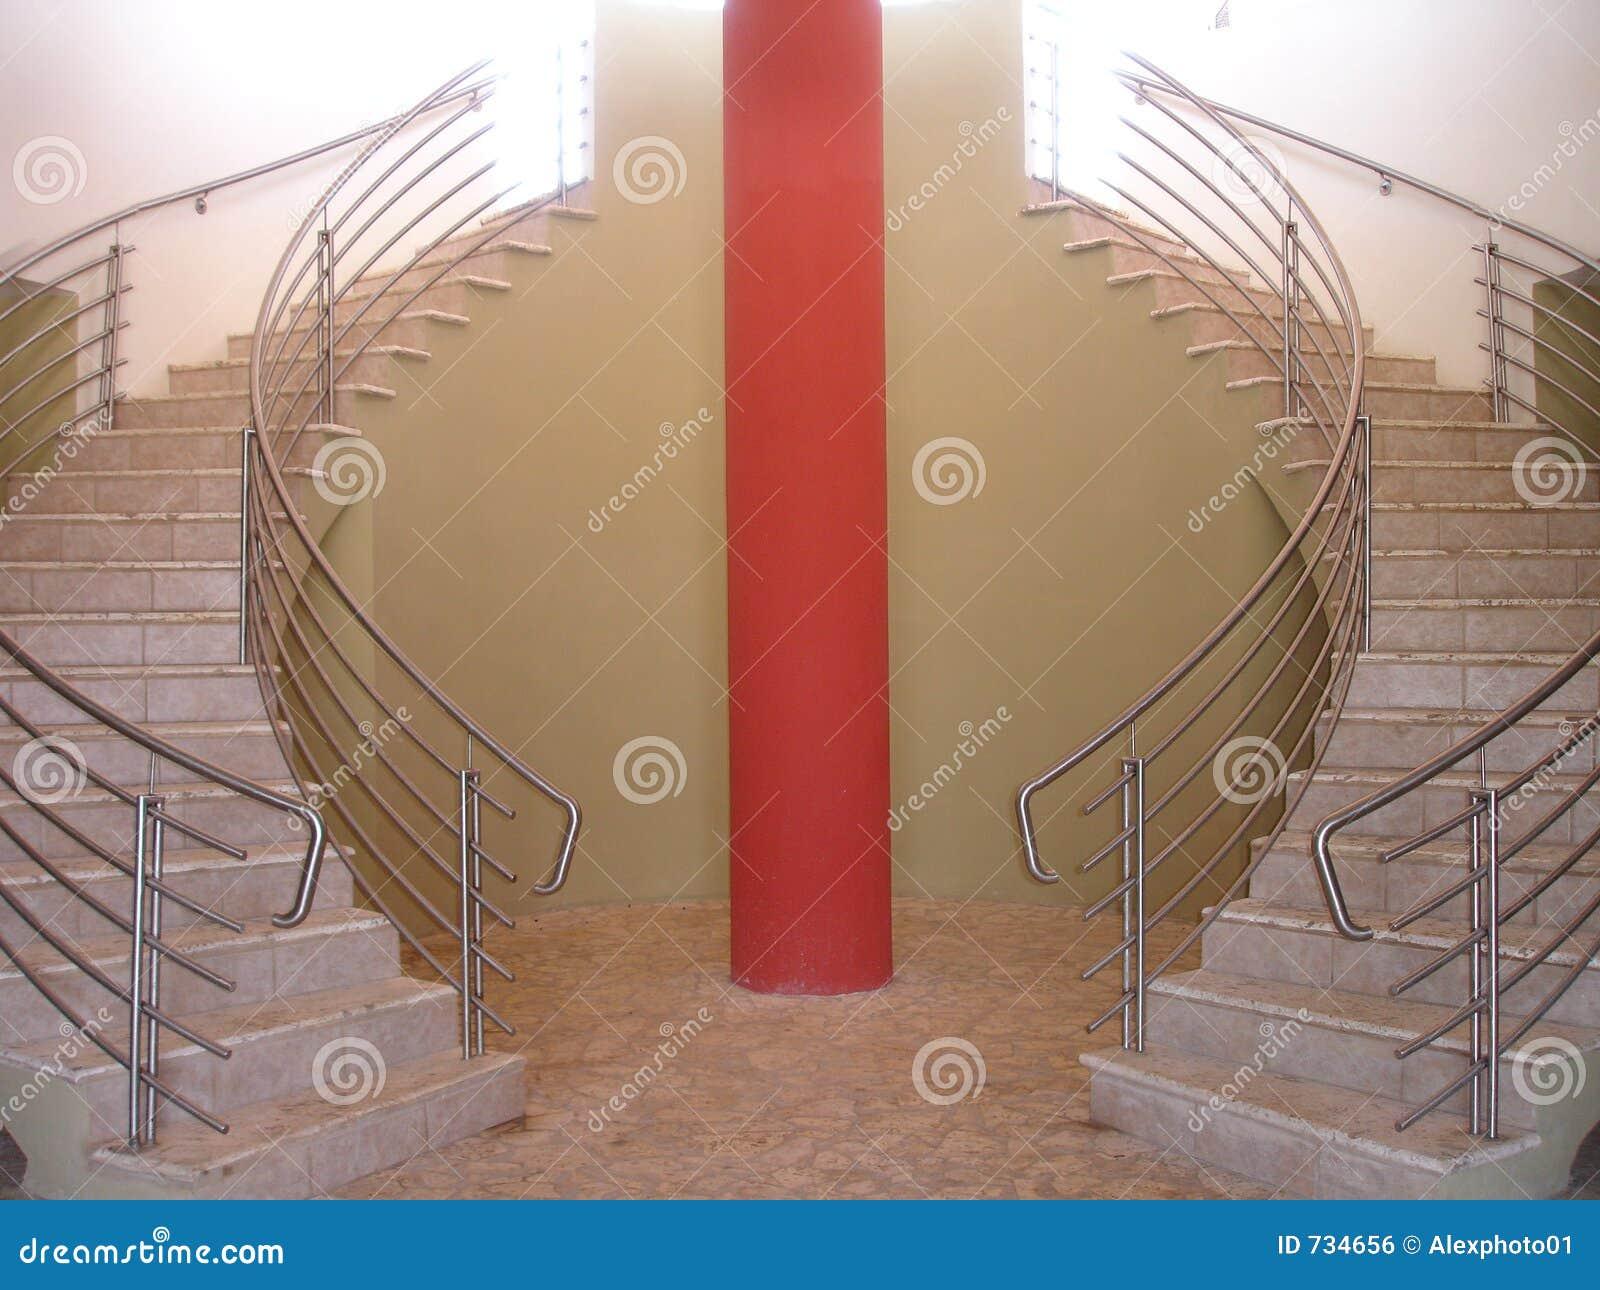 Escaliers au ciel, les Caraïbe, Porto Rico